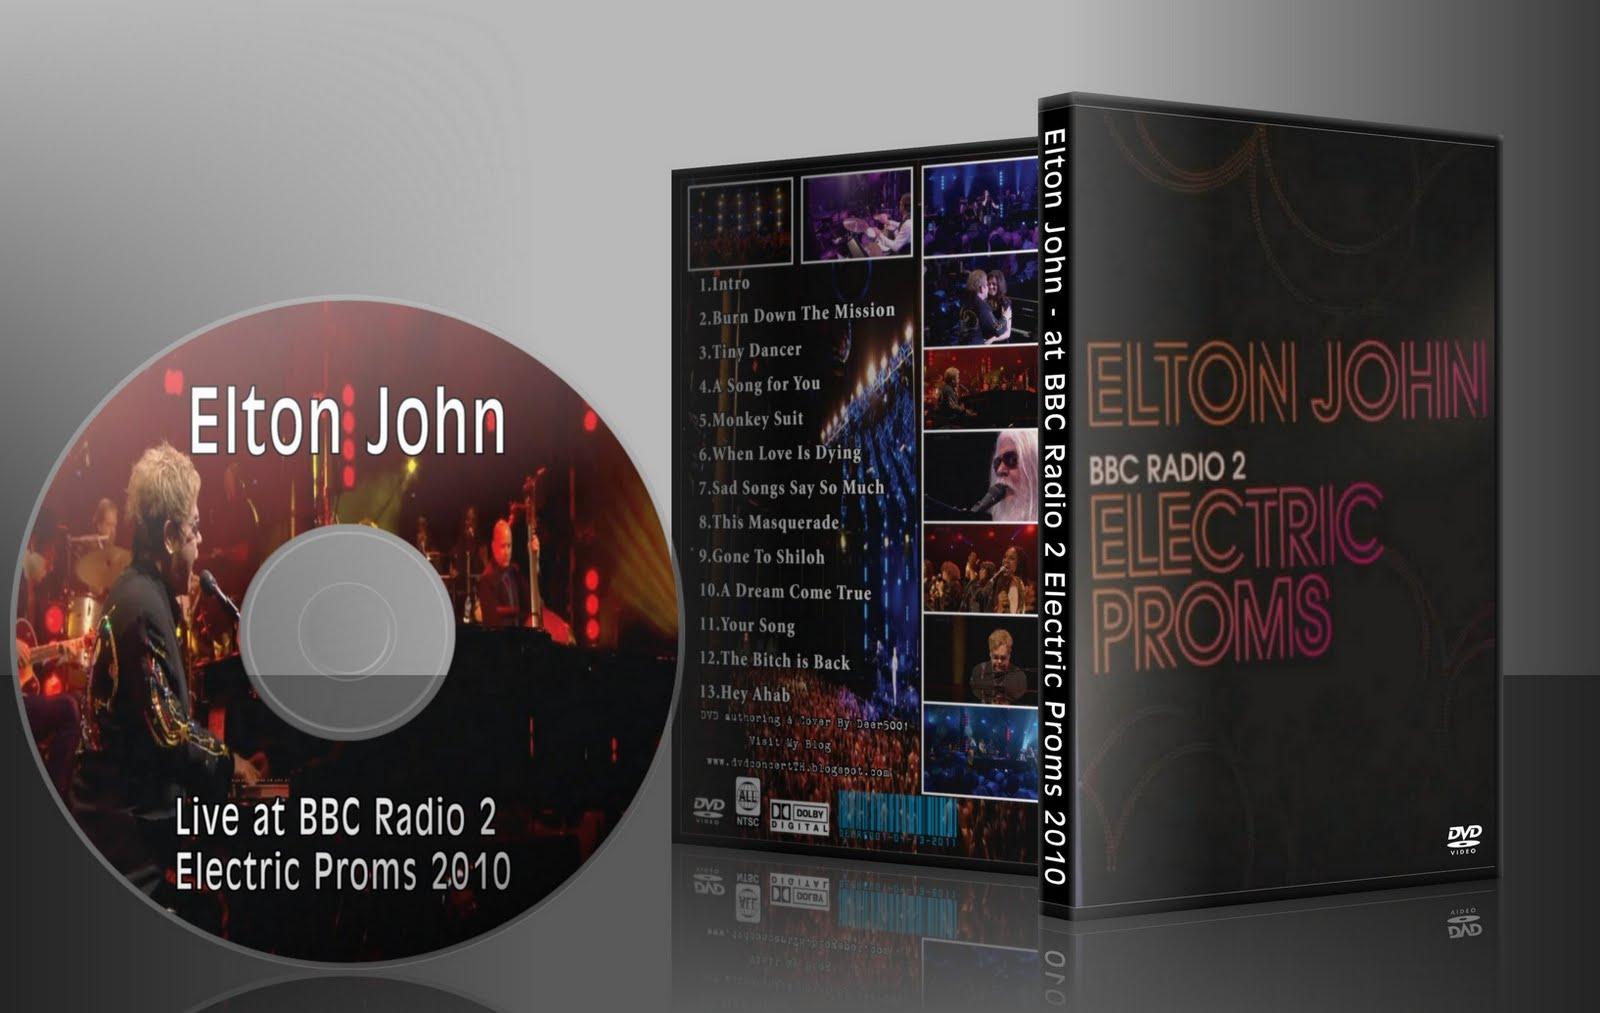 http://3.bp.blogspot.com/-3BMGJ24lJxc/TagL21hHU1I/AAAAAAAAChI/ji4sHiTL8fg/s1600/DVD+Cover+For+Show+-+Elton+John+-+BBC+Radio+2+-+Electric+Proms+-+2010.jpg